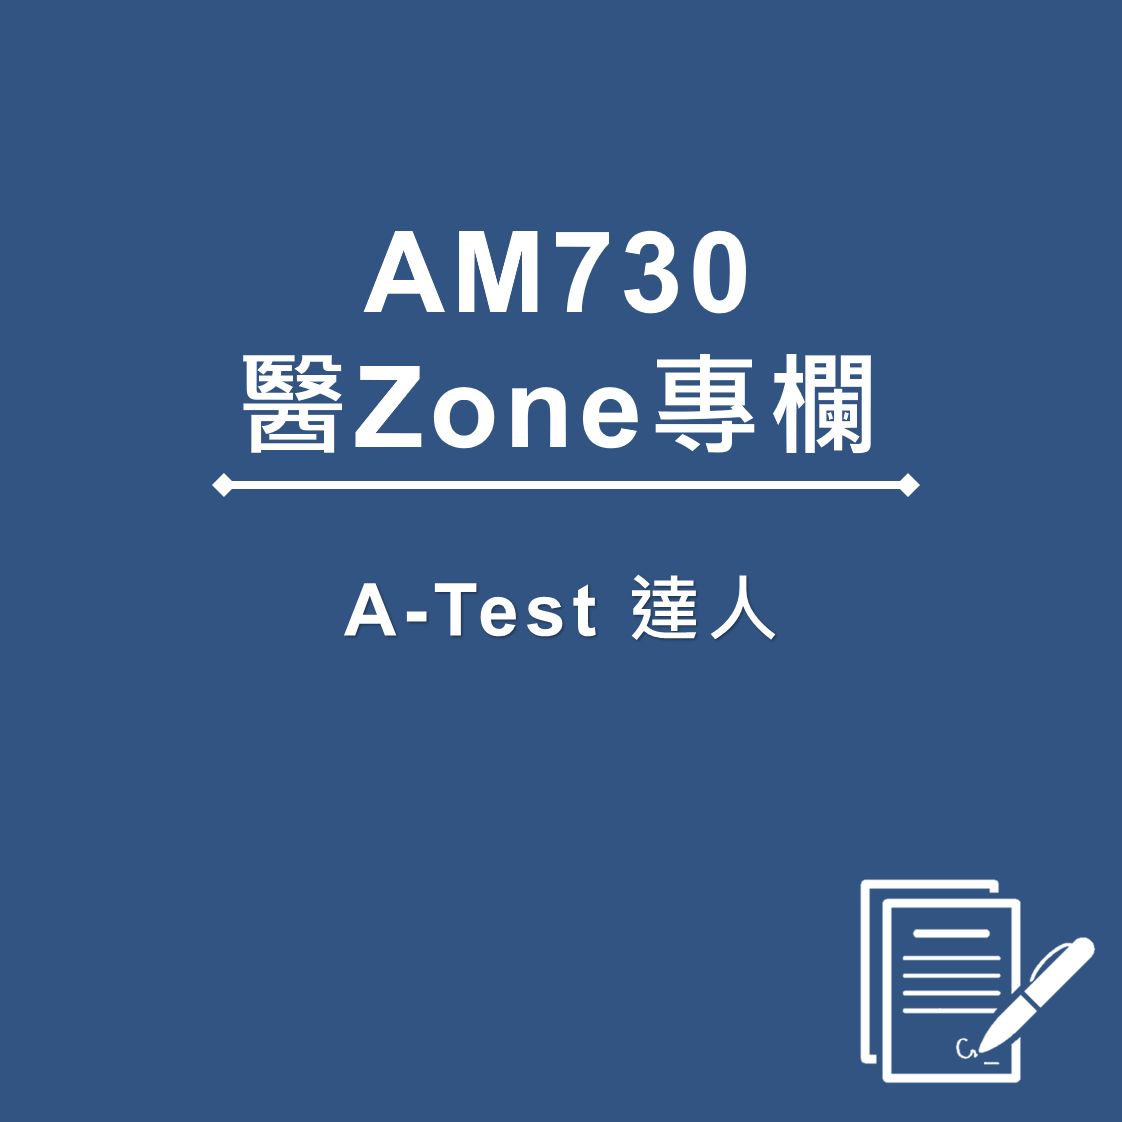 AM730 醫Zone 專欄 - A-Test 達人